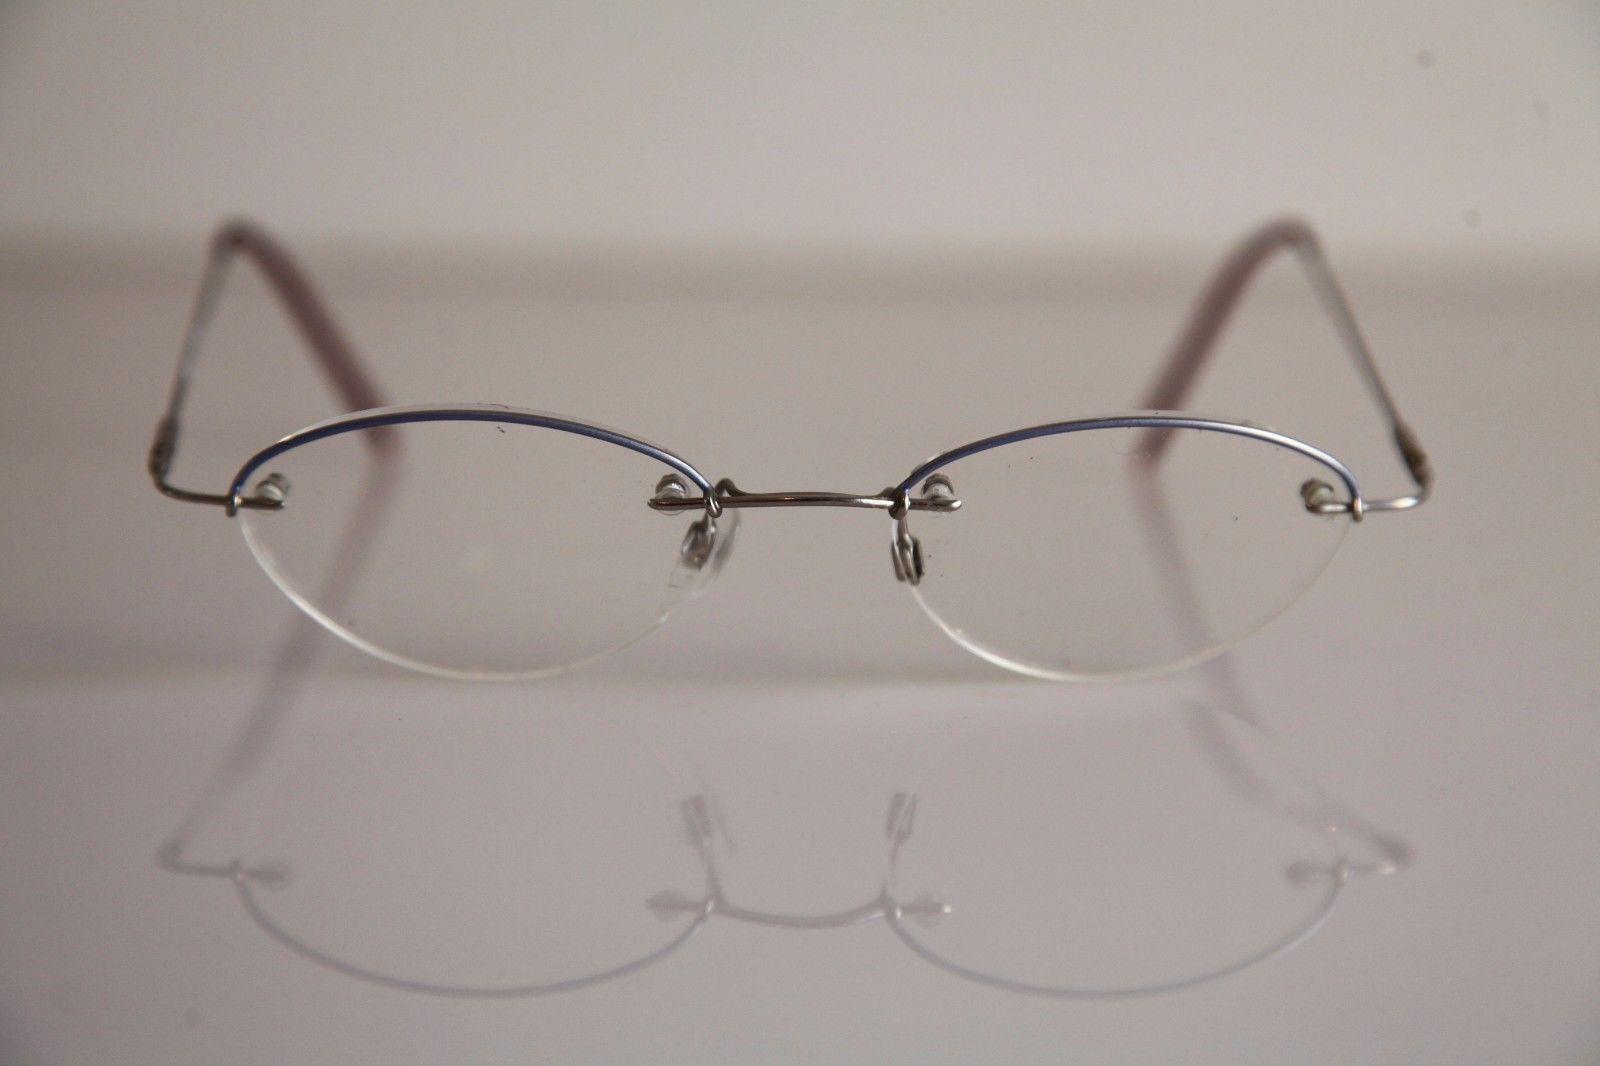 AMARETTA  ARGENTA Eyewear, Chrome Half Rimless Frame,   RX-Able Prescription.